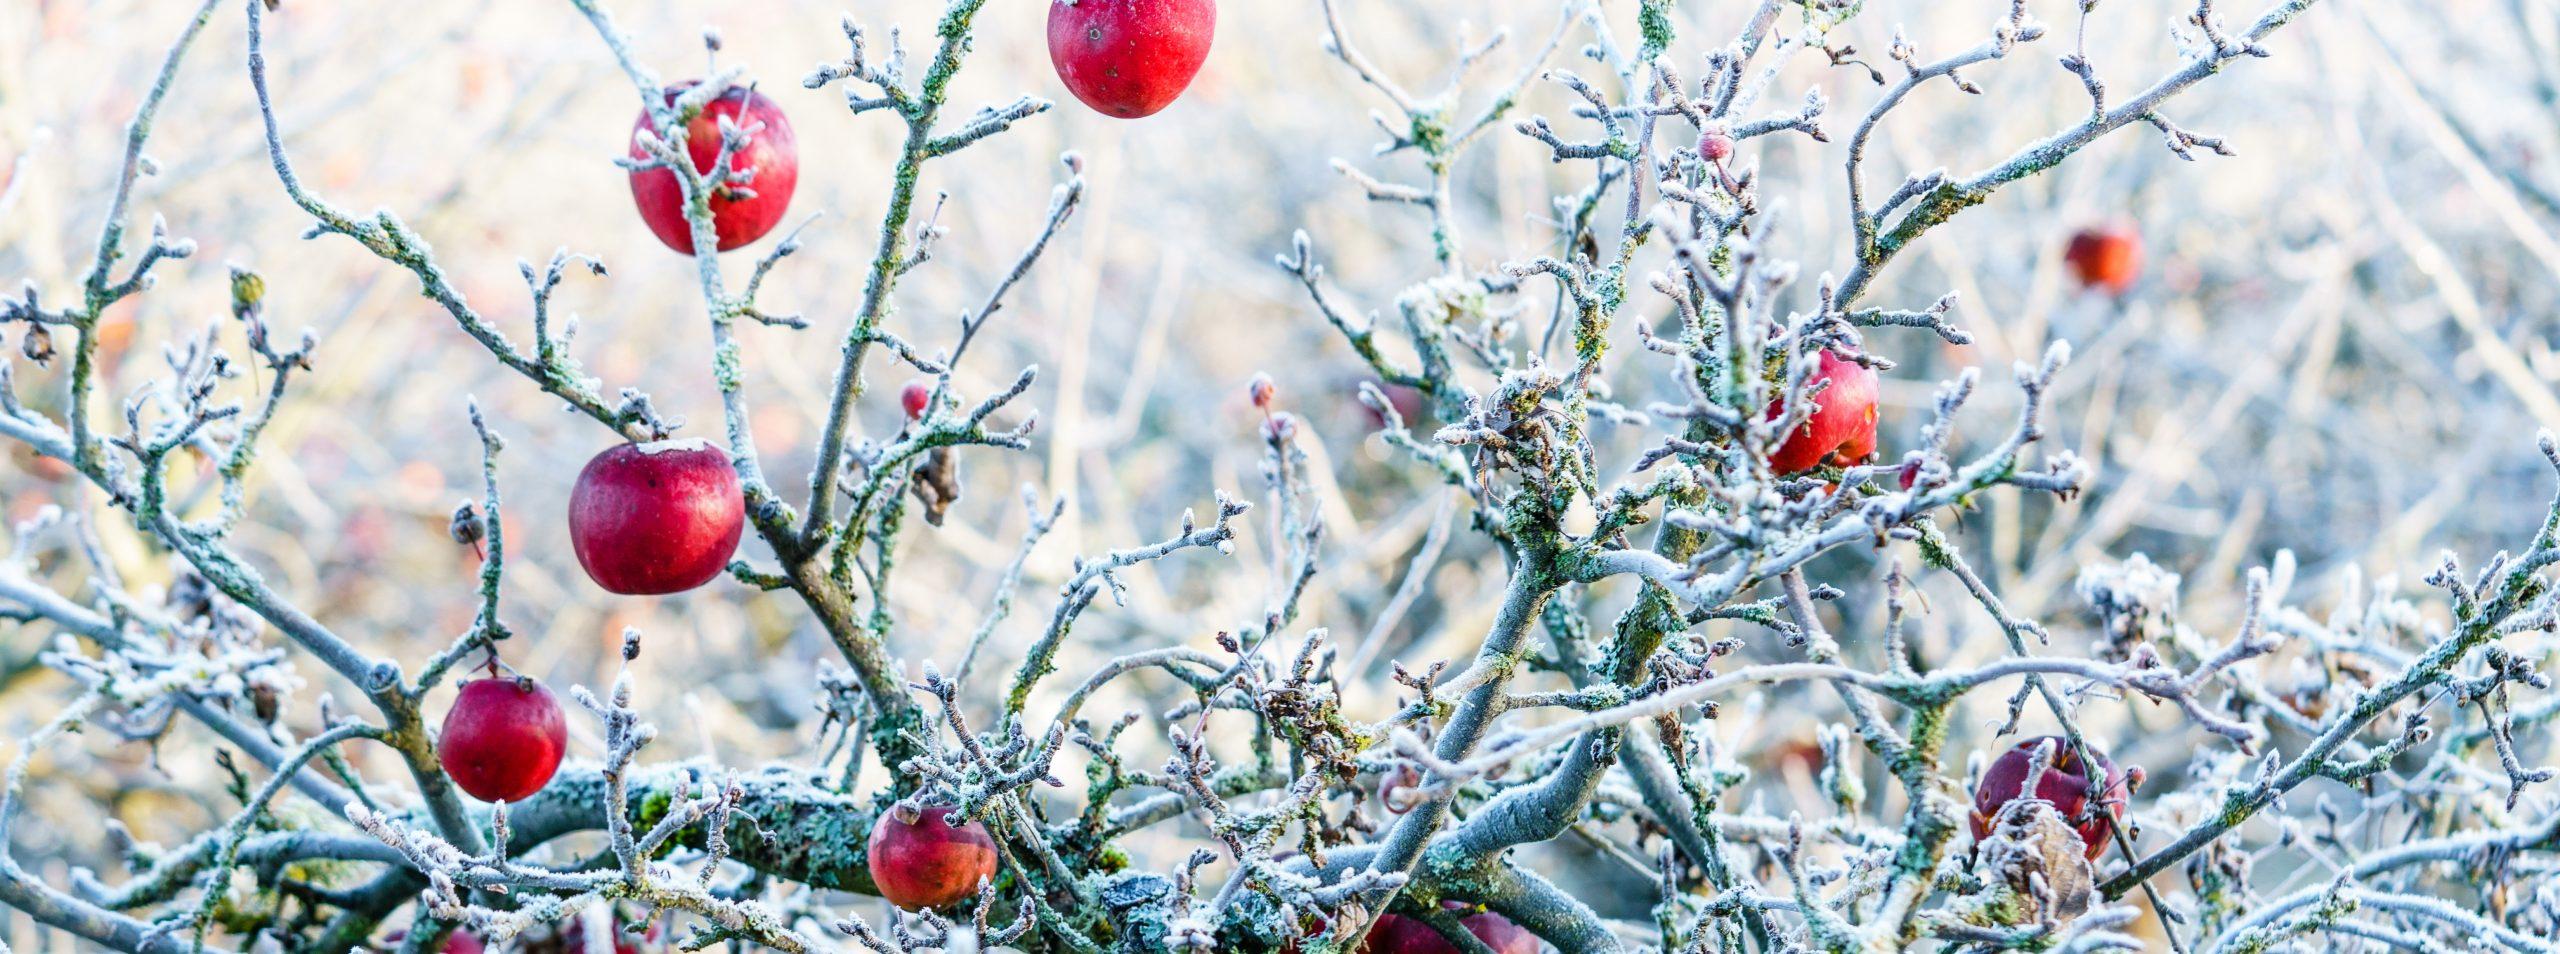 Madam Rote Rübe - Winterapfel